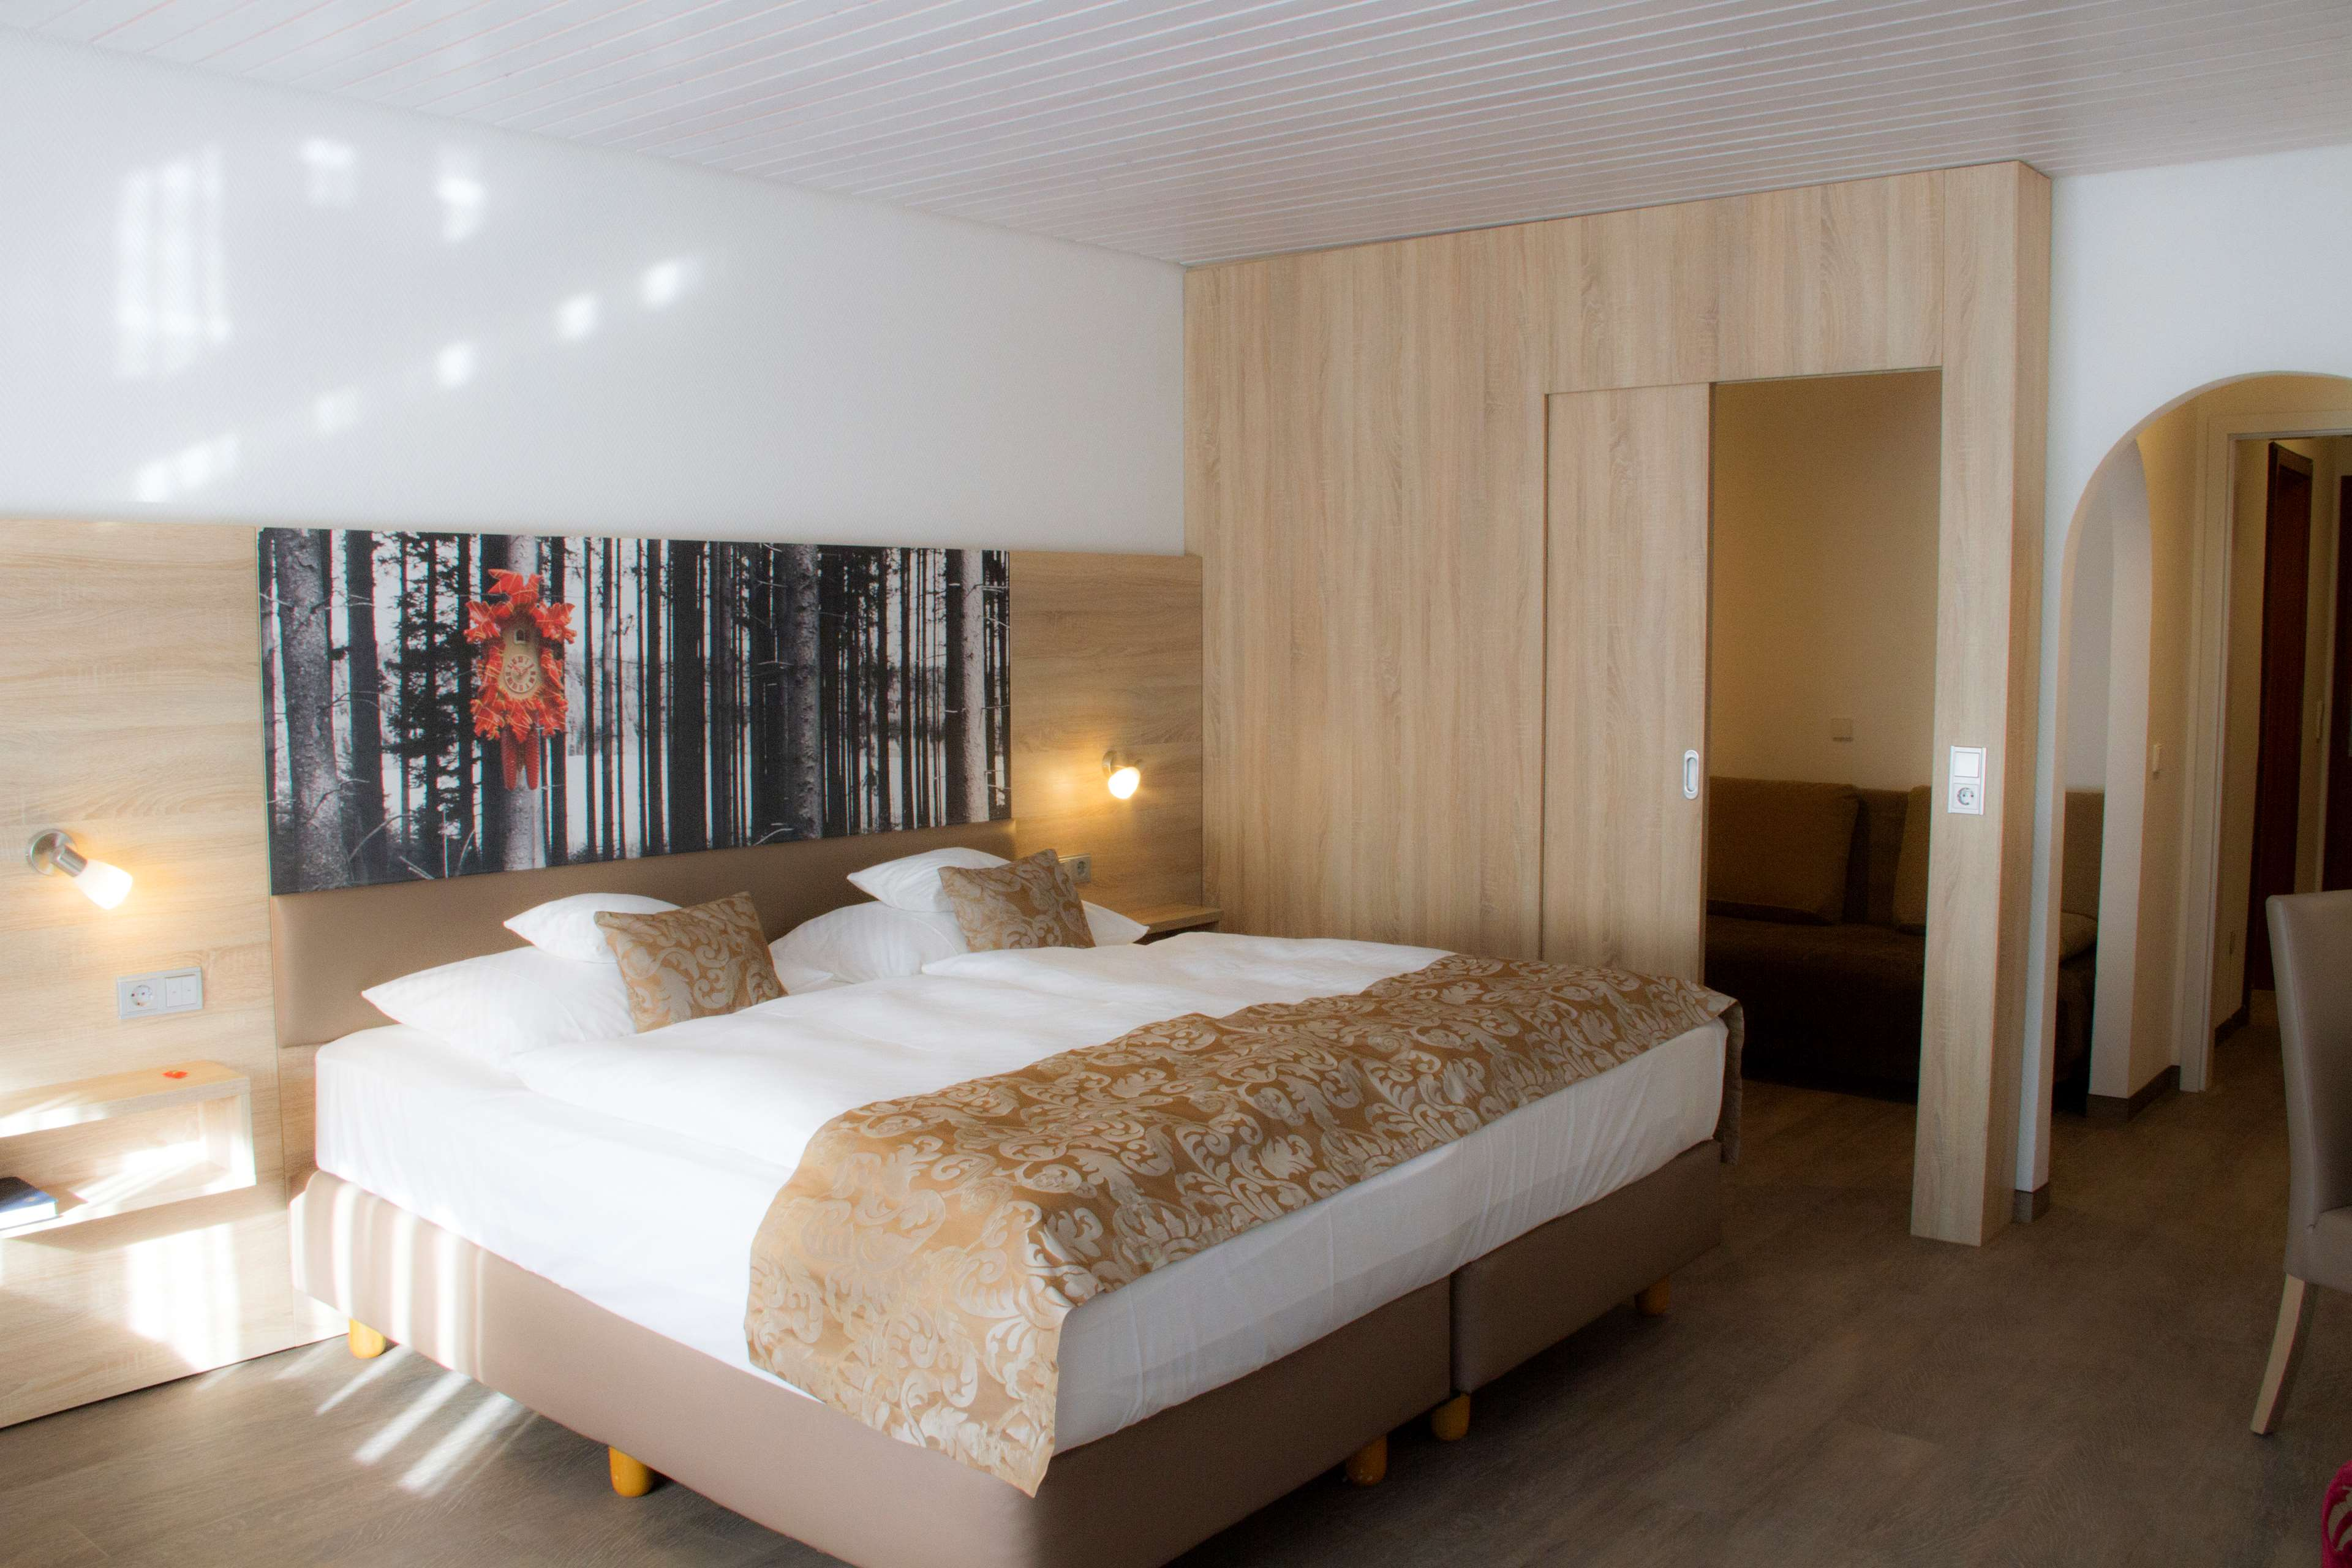 best western plus hotel schwarzwald residenz hotels hotels restaurants triberg deutschland. Black Bedroom Furniture Sets. Home Design Ideas